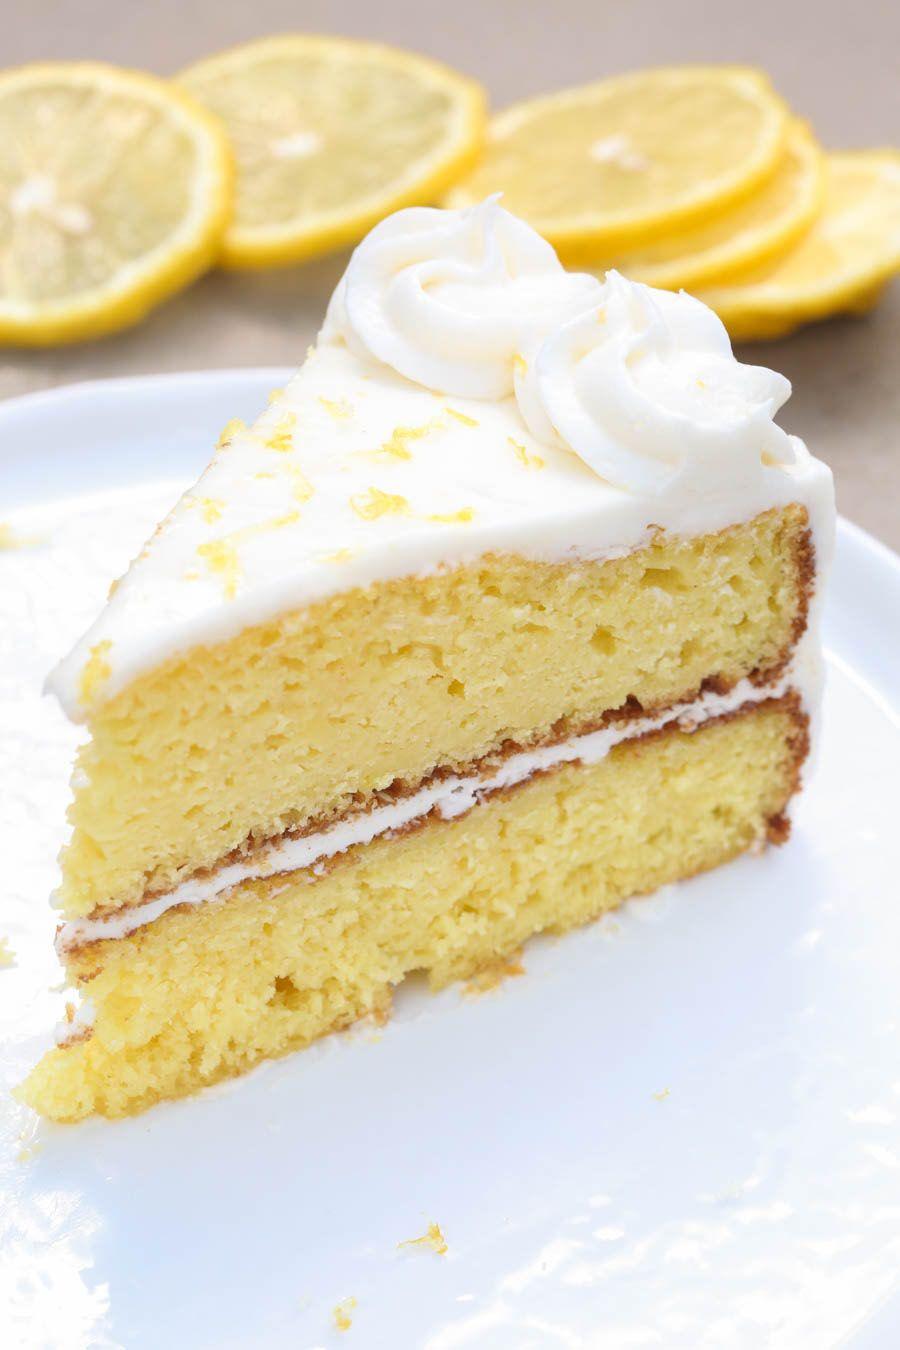 Lemon Cake Recipe With Images Lemon Cake Recipe Homemade